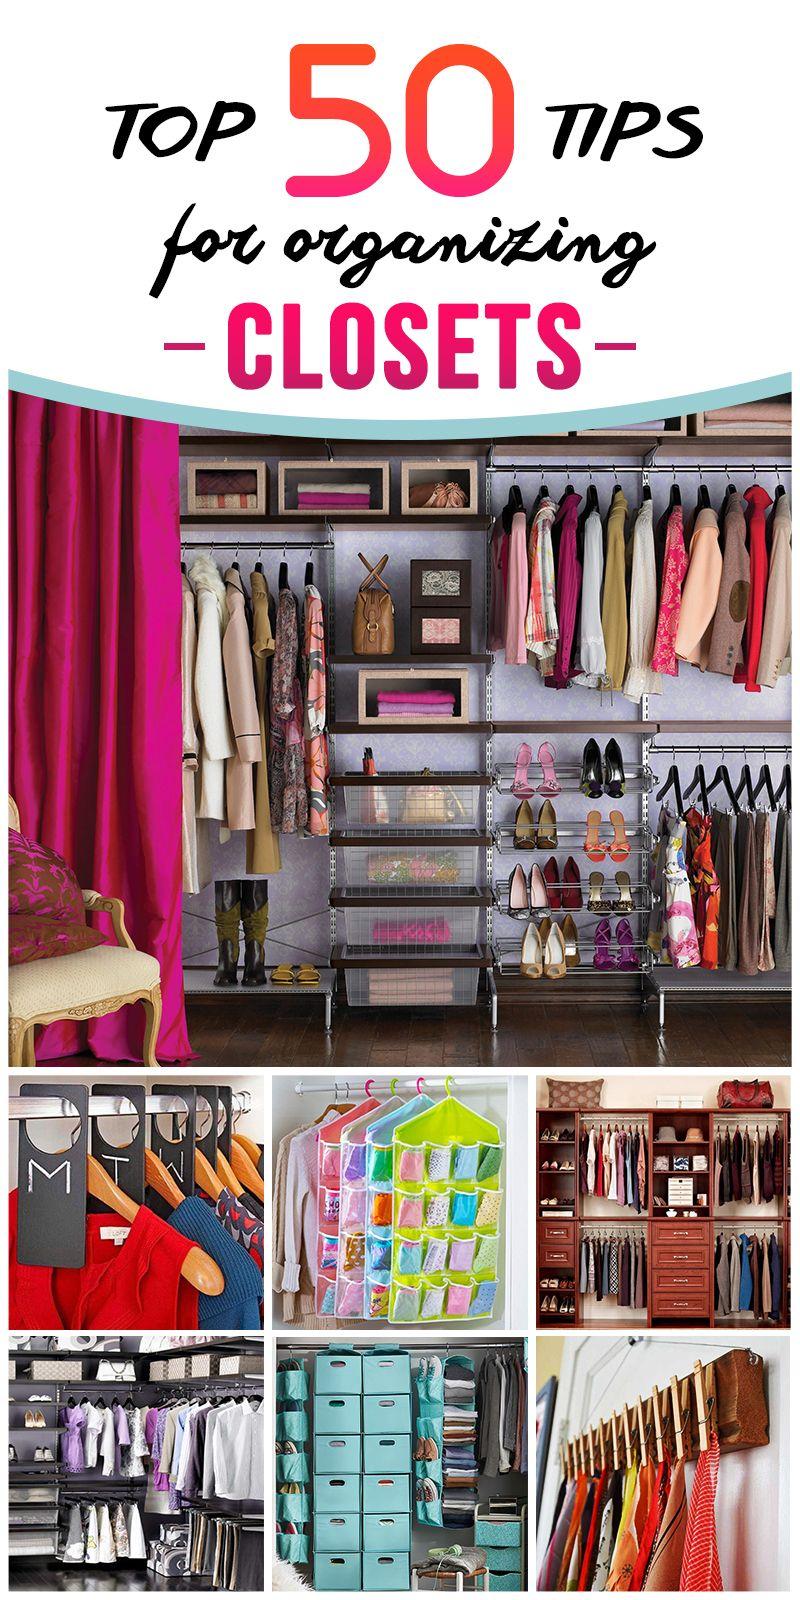 Best Closet Organizing Ideas Organizing Organizingtips Https